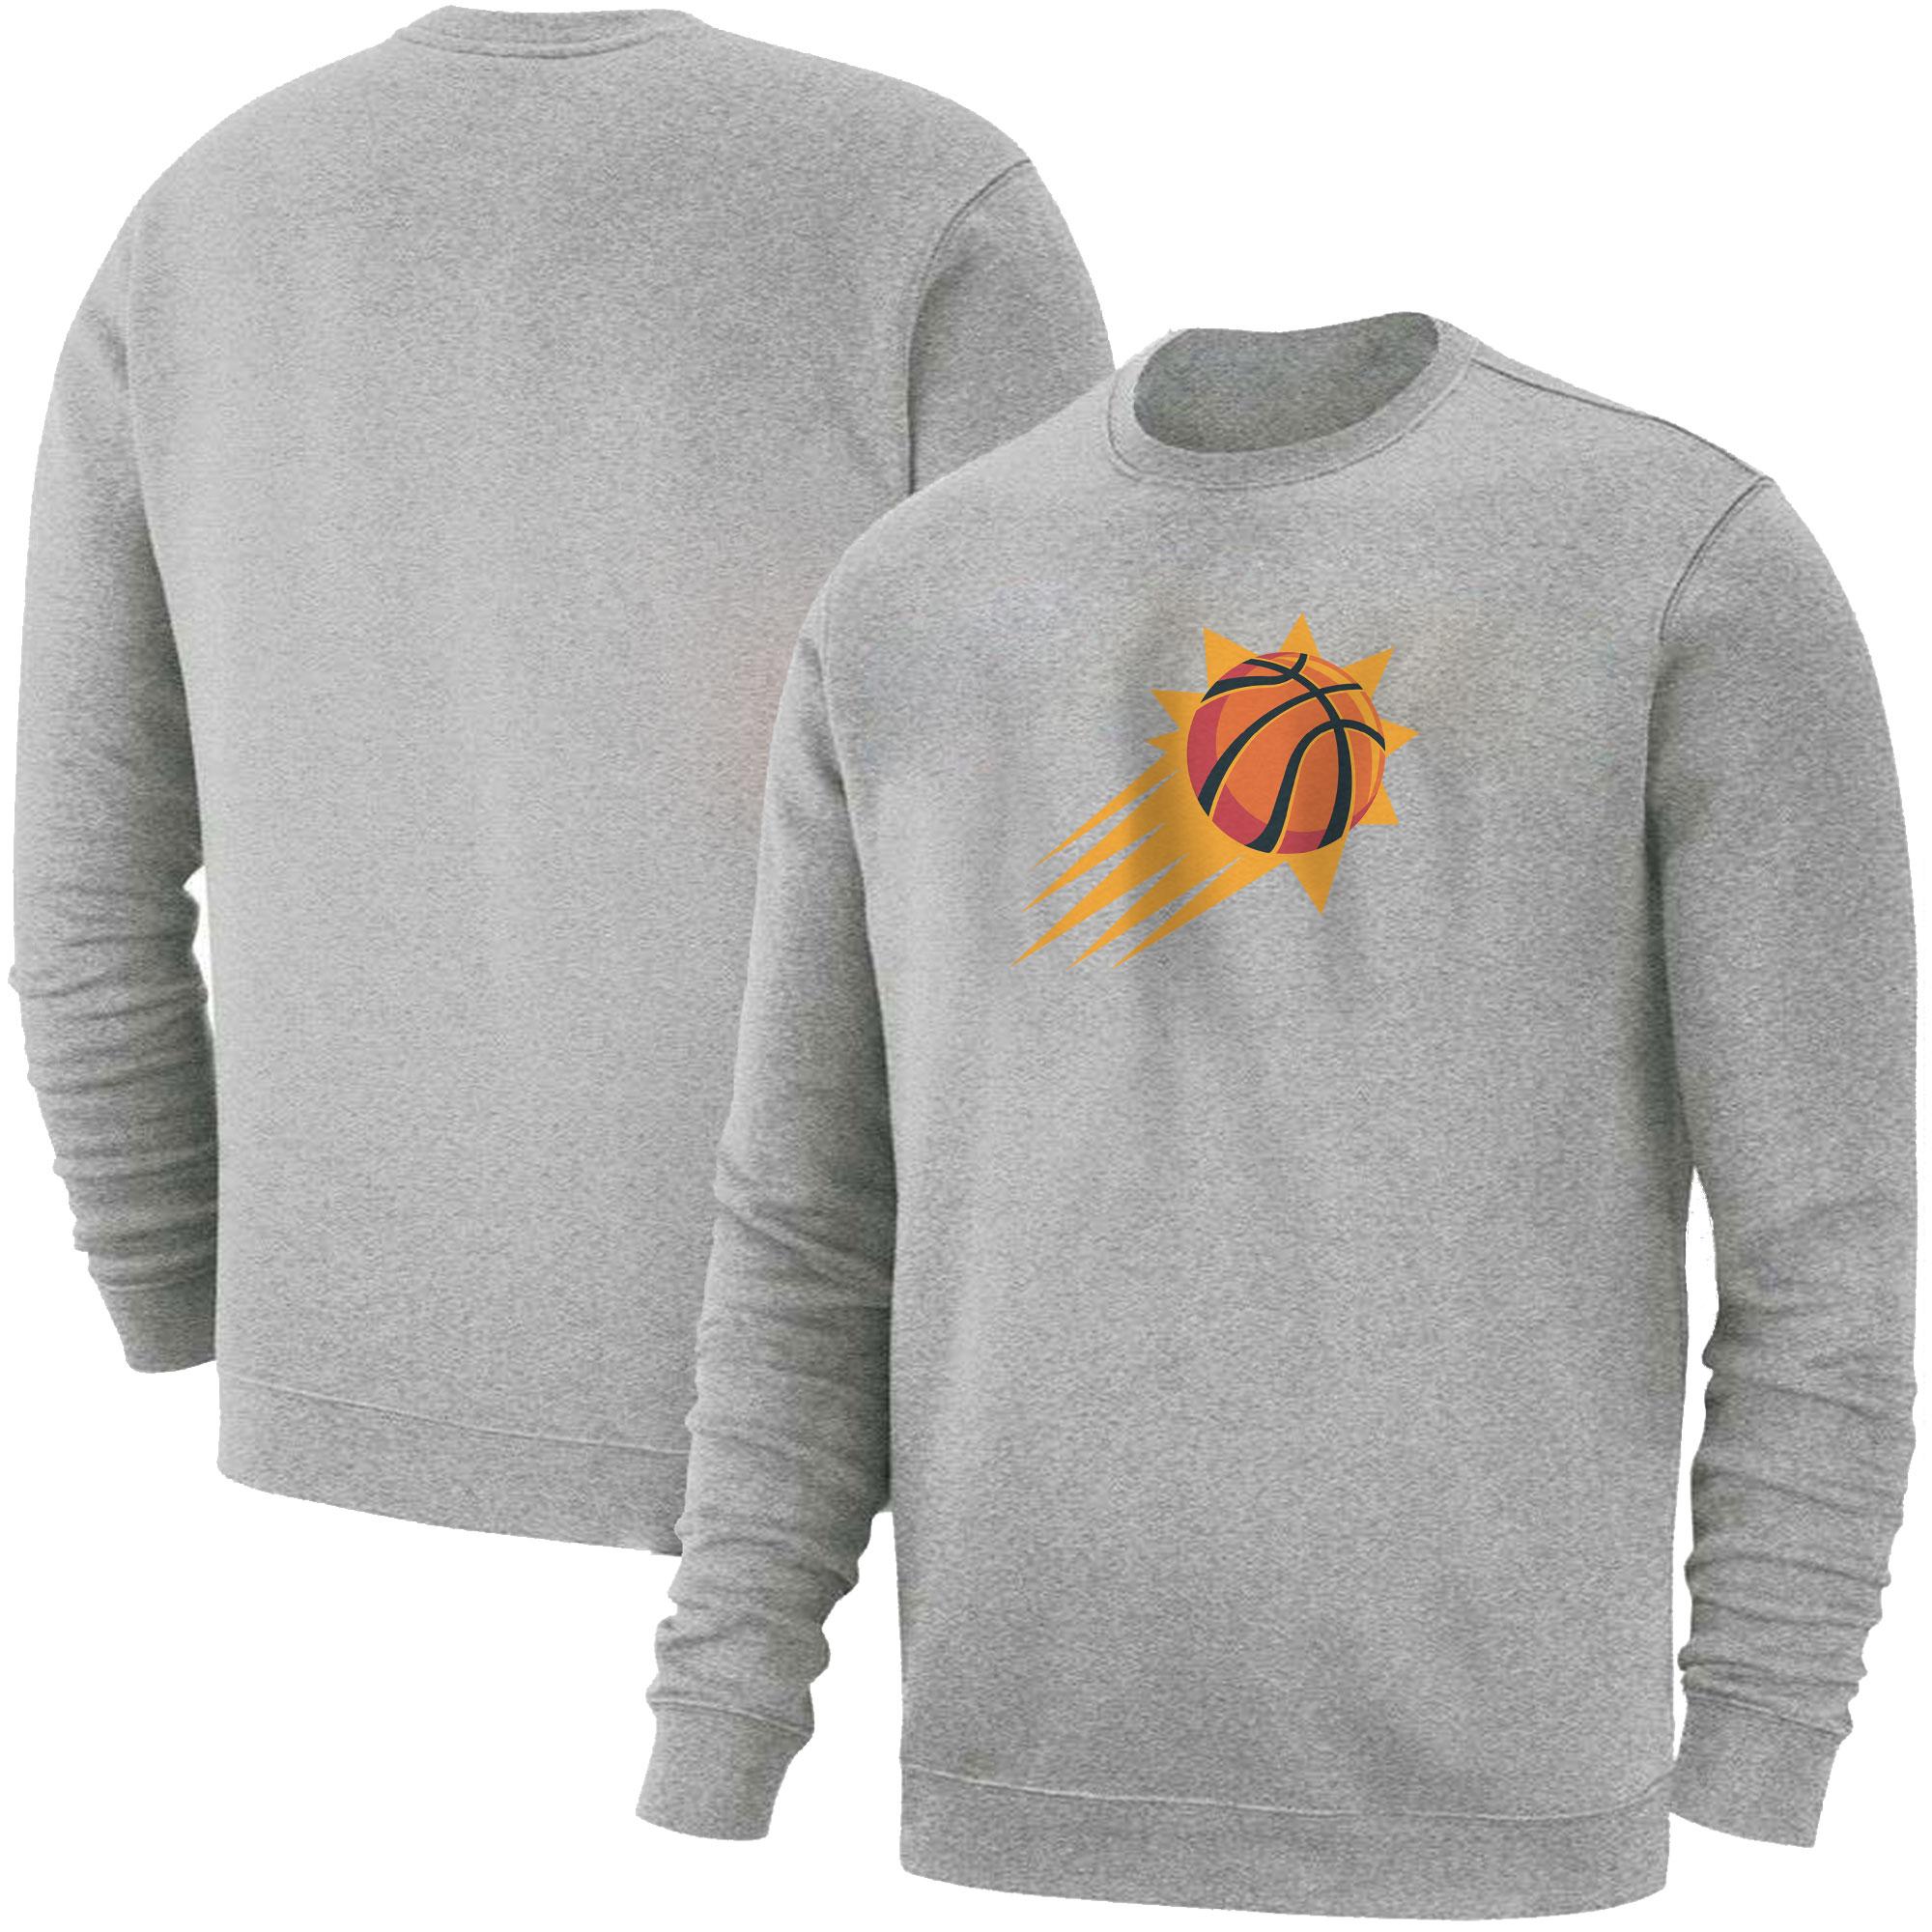 Phoenix Suns Basic (BSC-GRY-NP-406-NBA-PHO-SUNS-NEW)